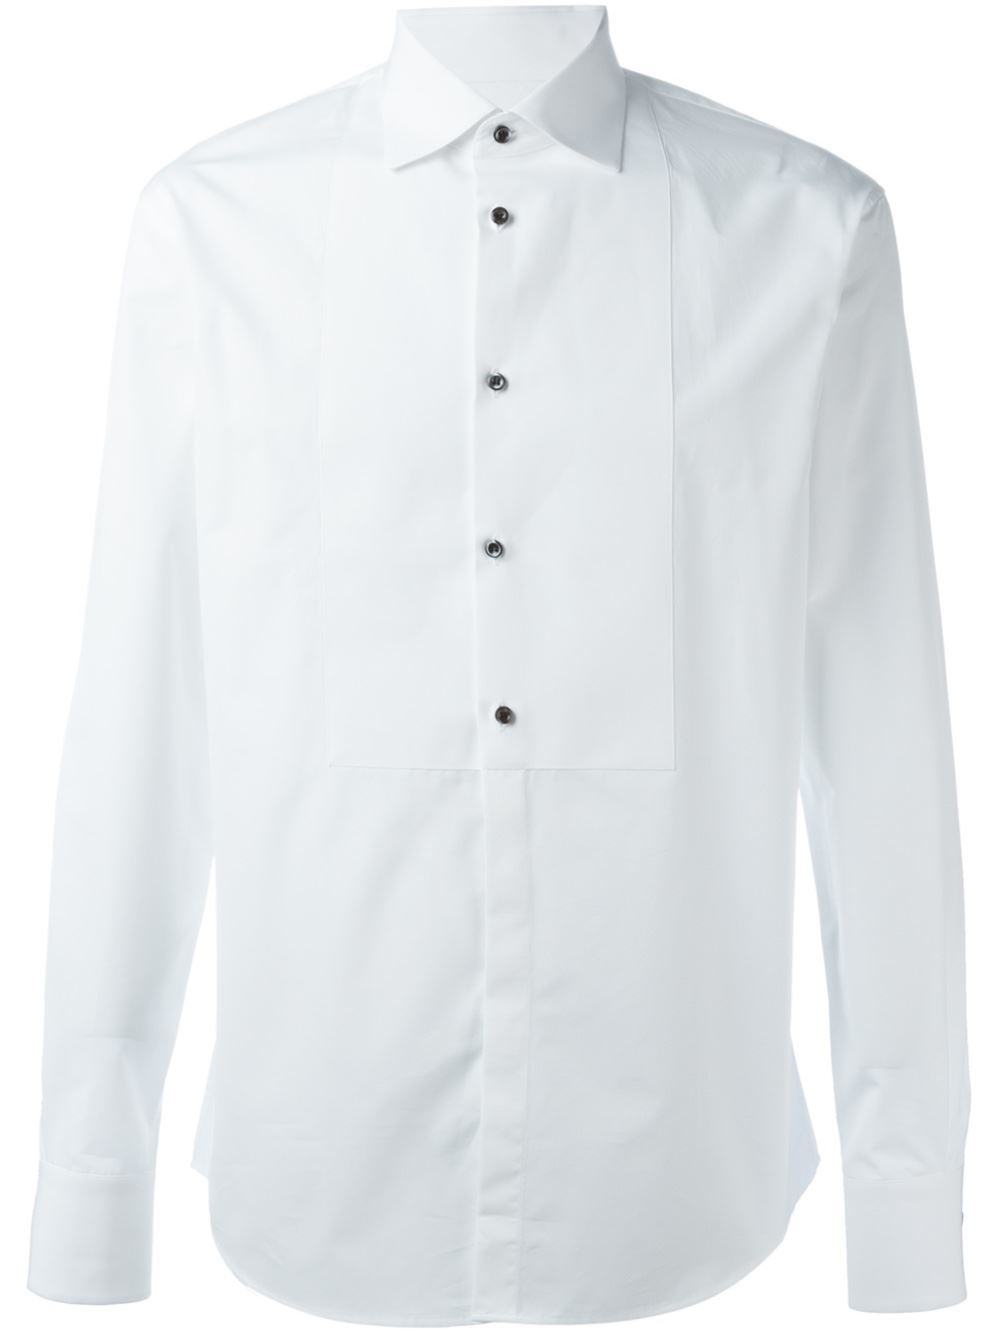 Camisa con botones negros. De Dsquared2 (384 euros).